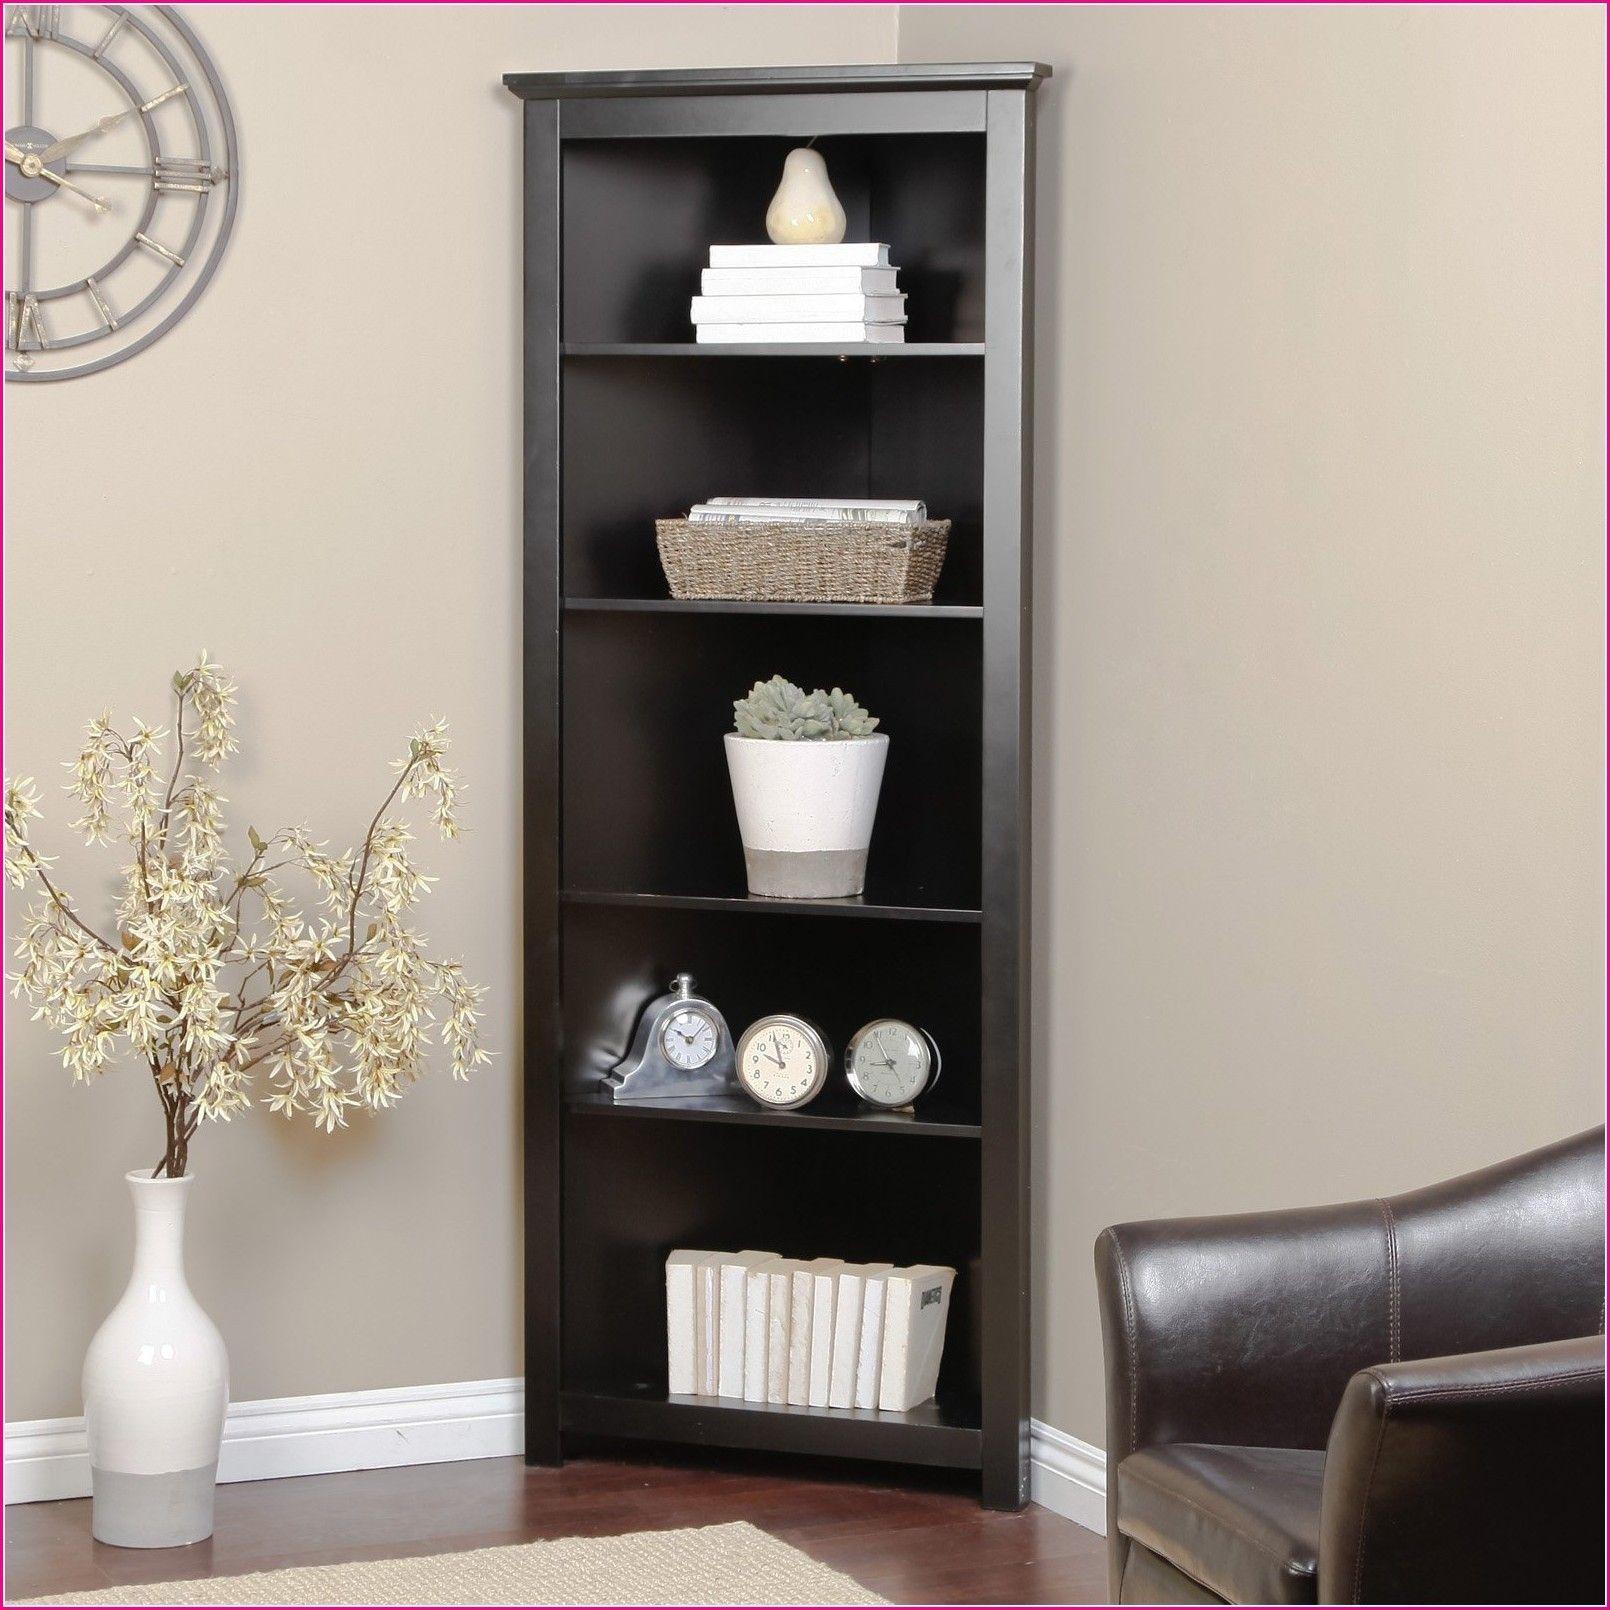 Corner Shelf Units Living Room Https Www Otoseriilan Com In 2020 Corner Cabinet Living Room Corner Bookshelves Tall Corner Cabinet